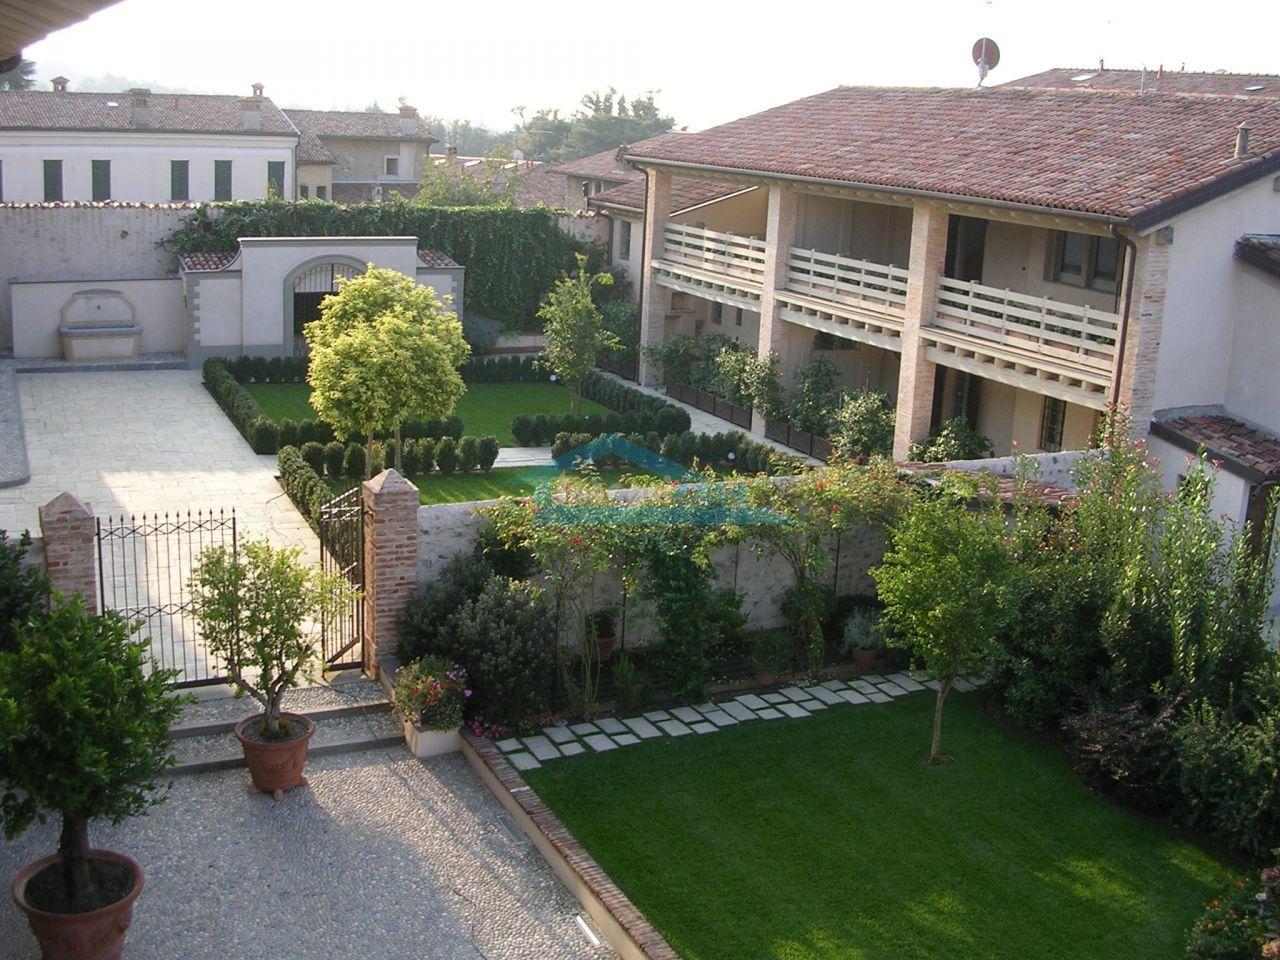 Vista del giardino condominiale Indipendente  a Erbusco